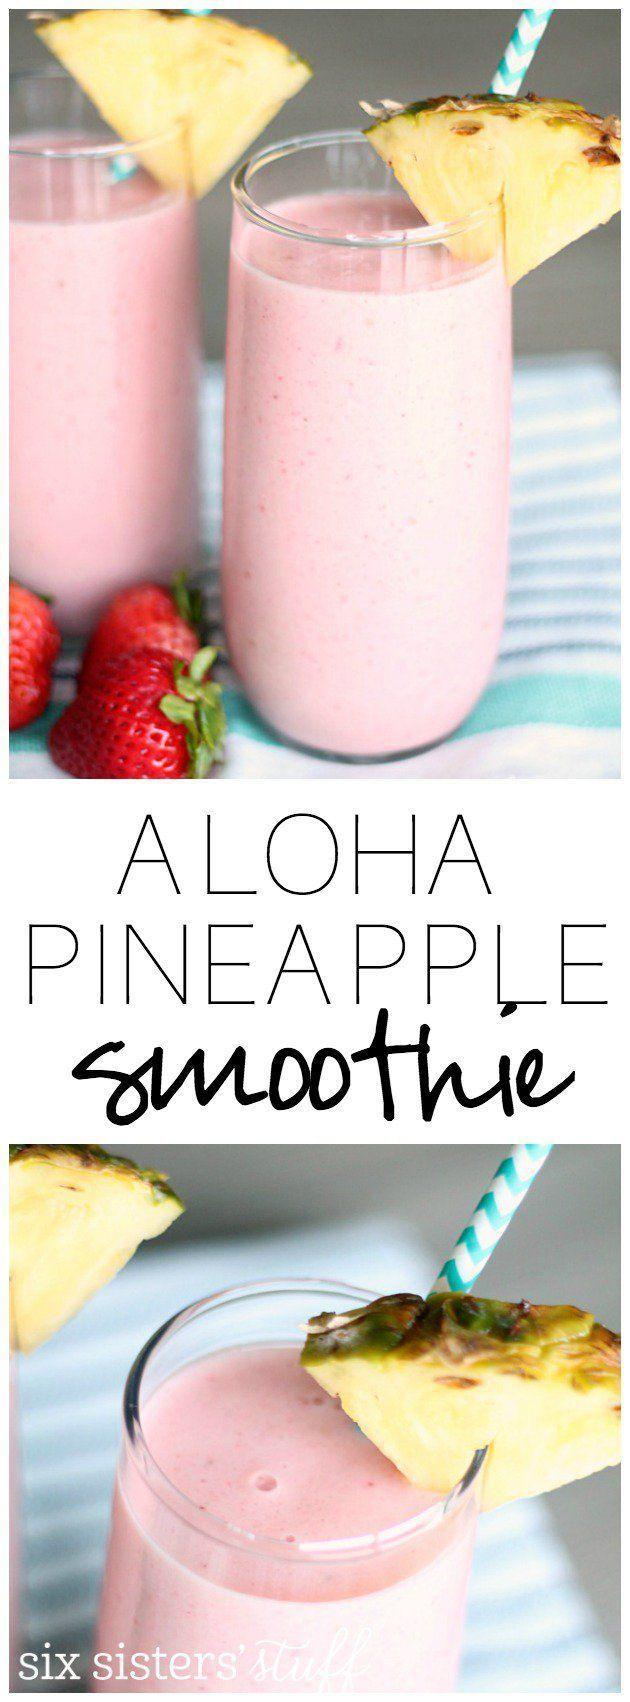 Wedding - Copycat Jamba Juice Aloha Pineapple Smoothie